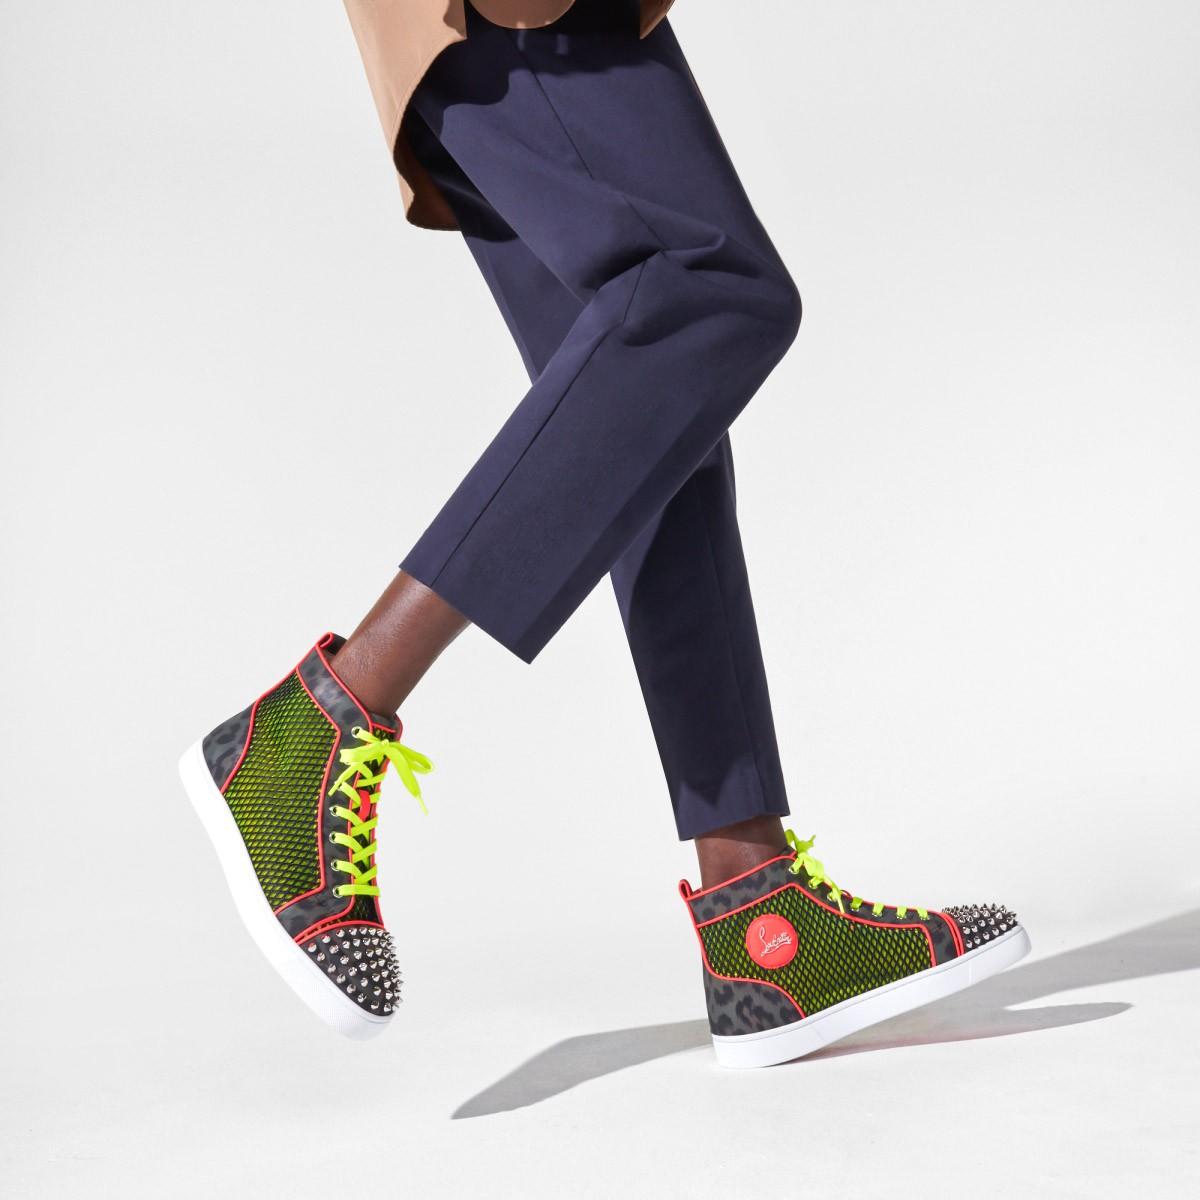 Shoes - Ac Lou Spikes Orlato Flat - Christian Louboutin